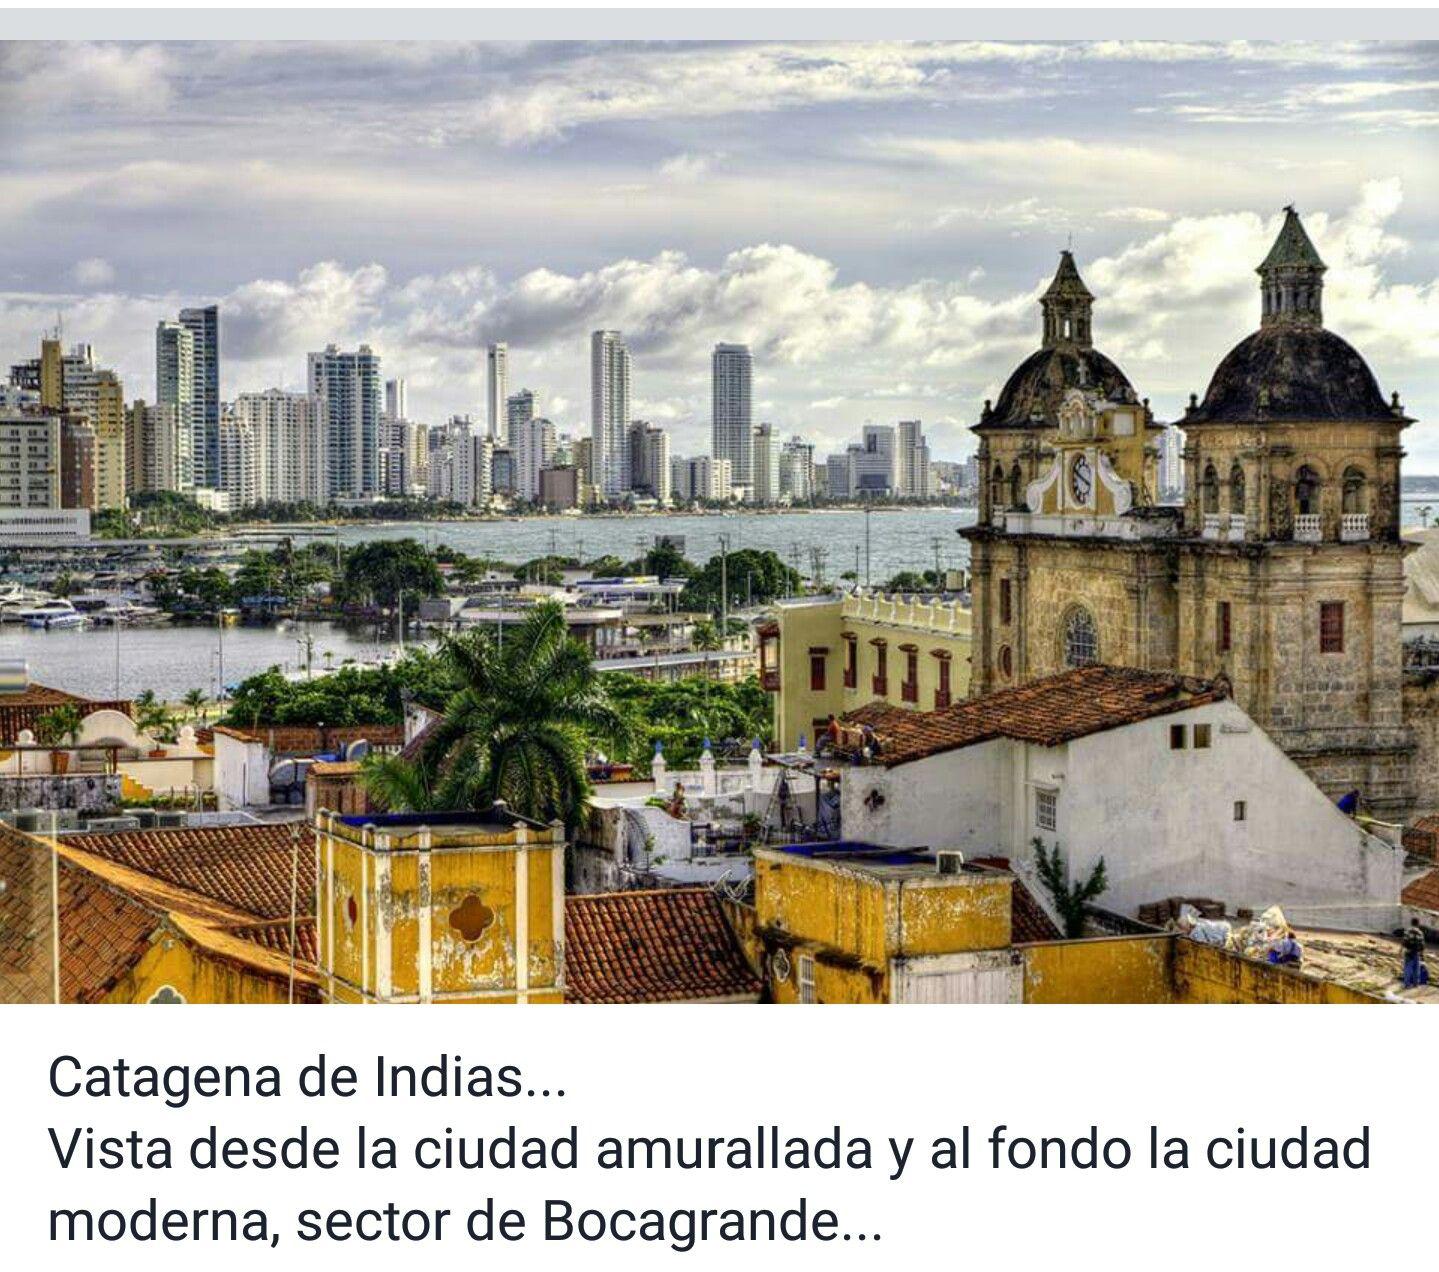 Cartagena de Indias..